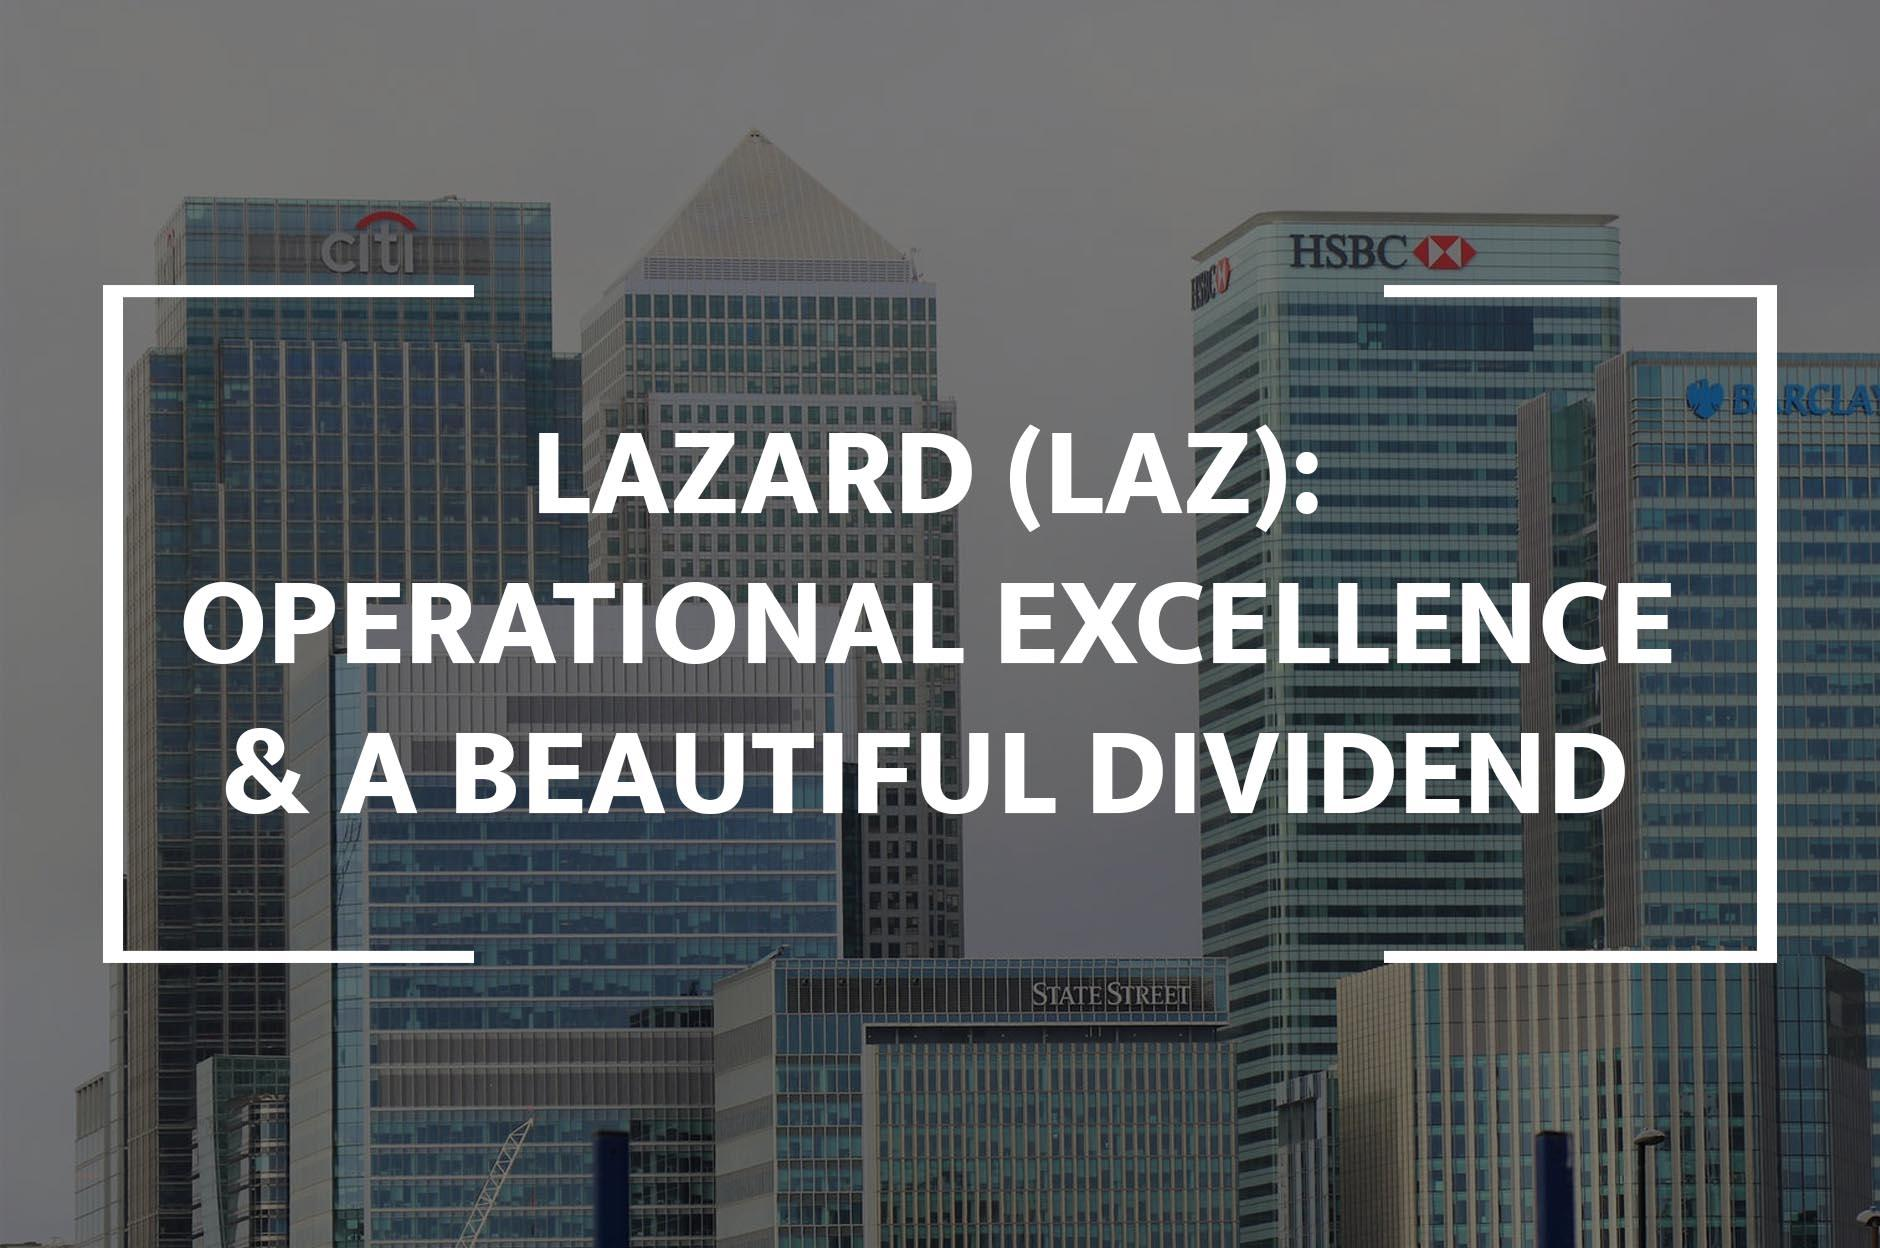 Lazard: Operational Excellence And A Beautiful Dividend - Lazard Ltd (NYSE:LAZ) | Seeking Alpha